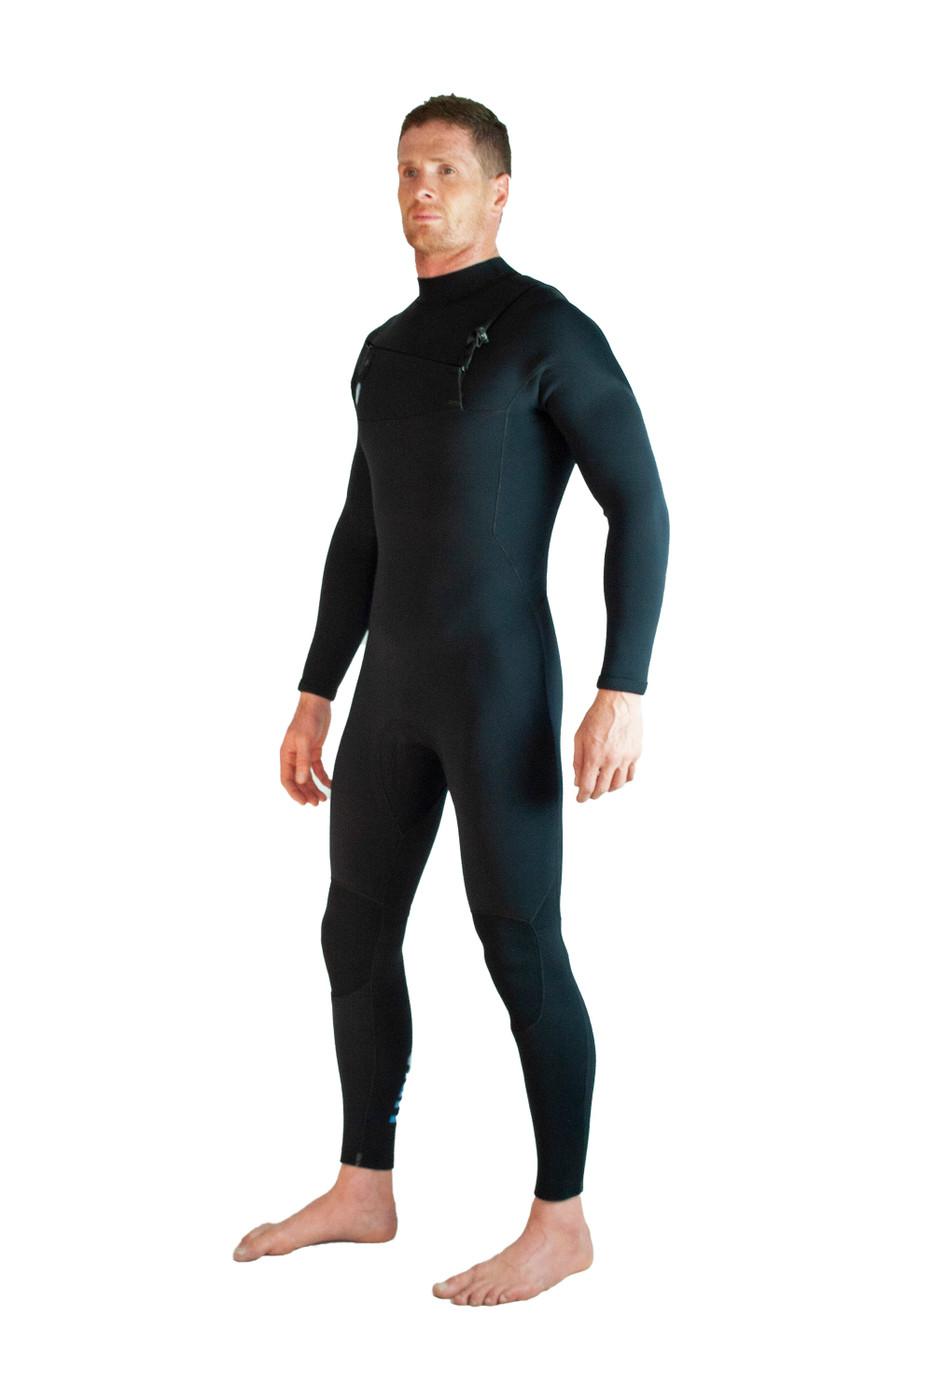 Best mens wetsuit Lunasurf